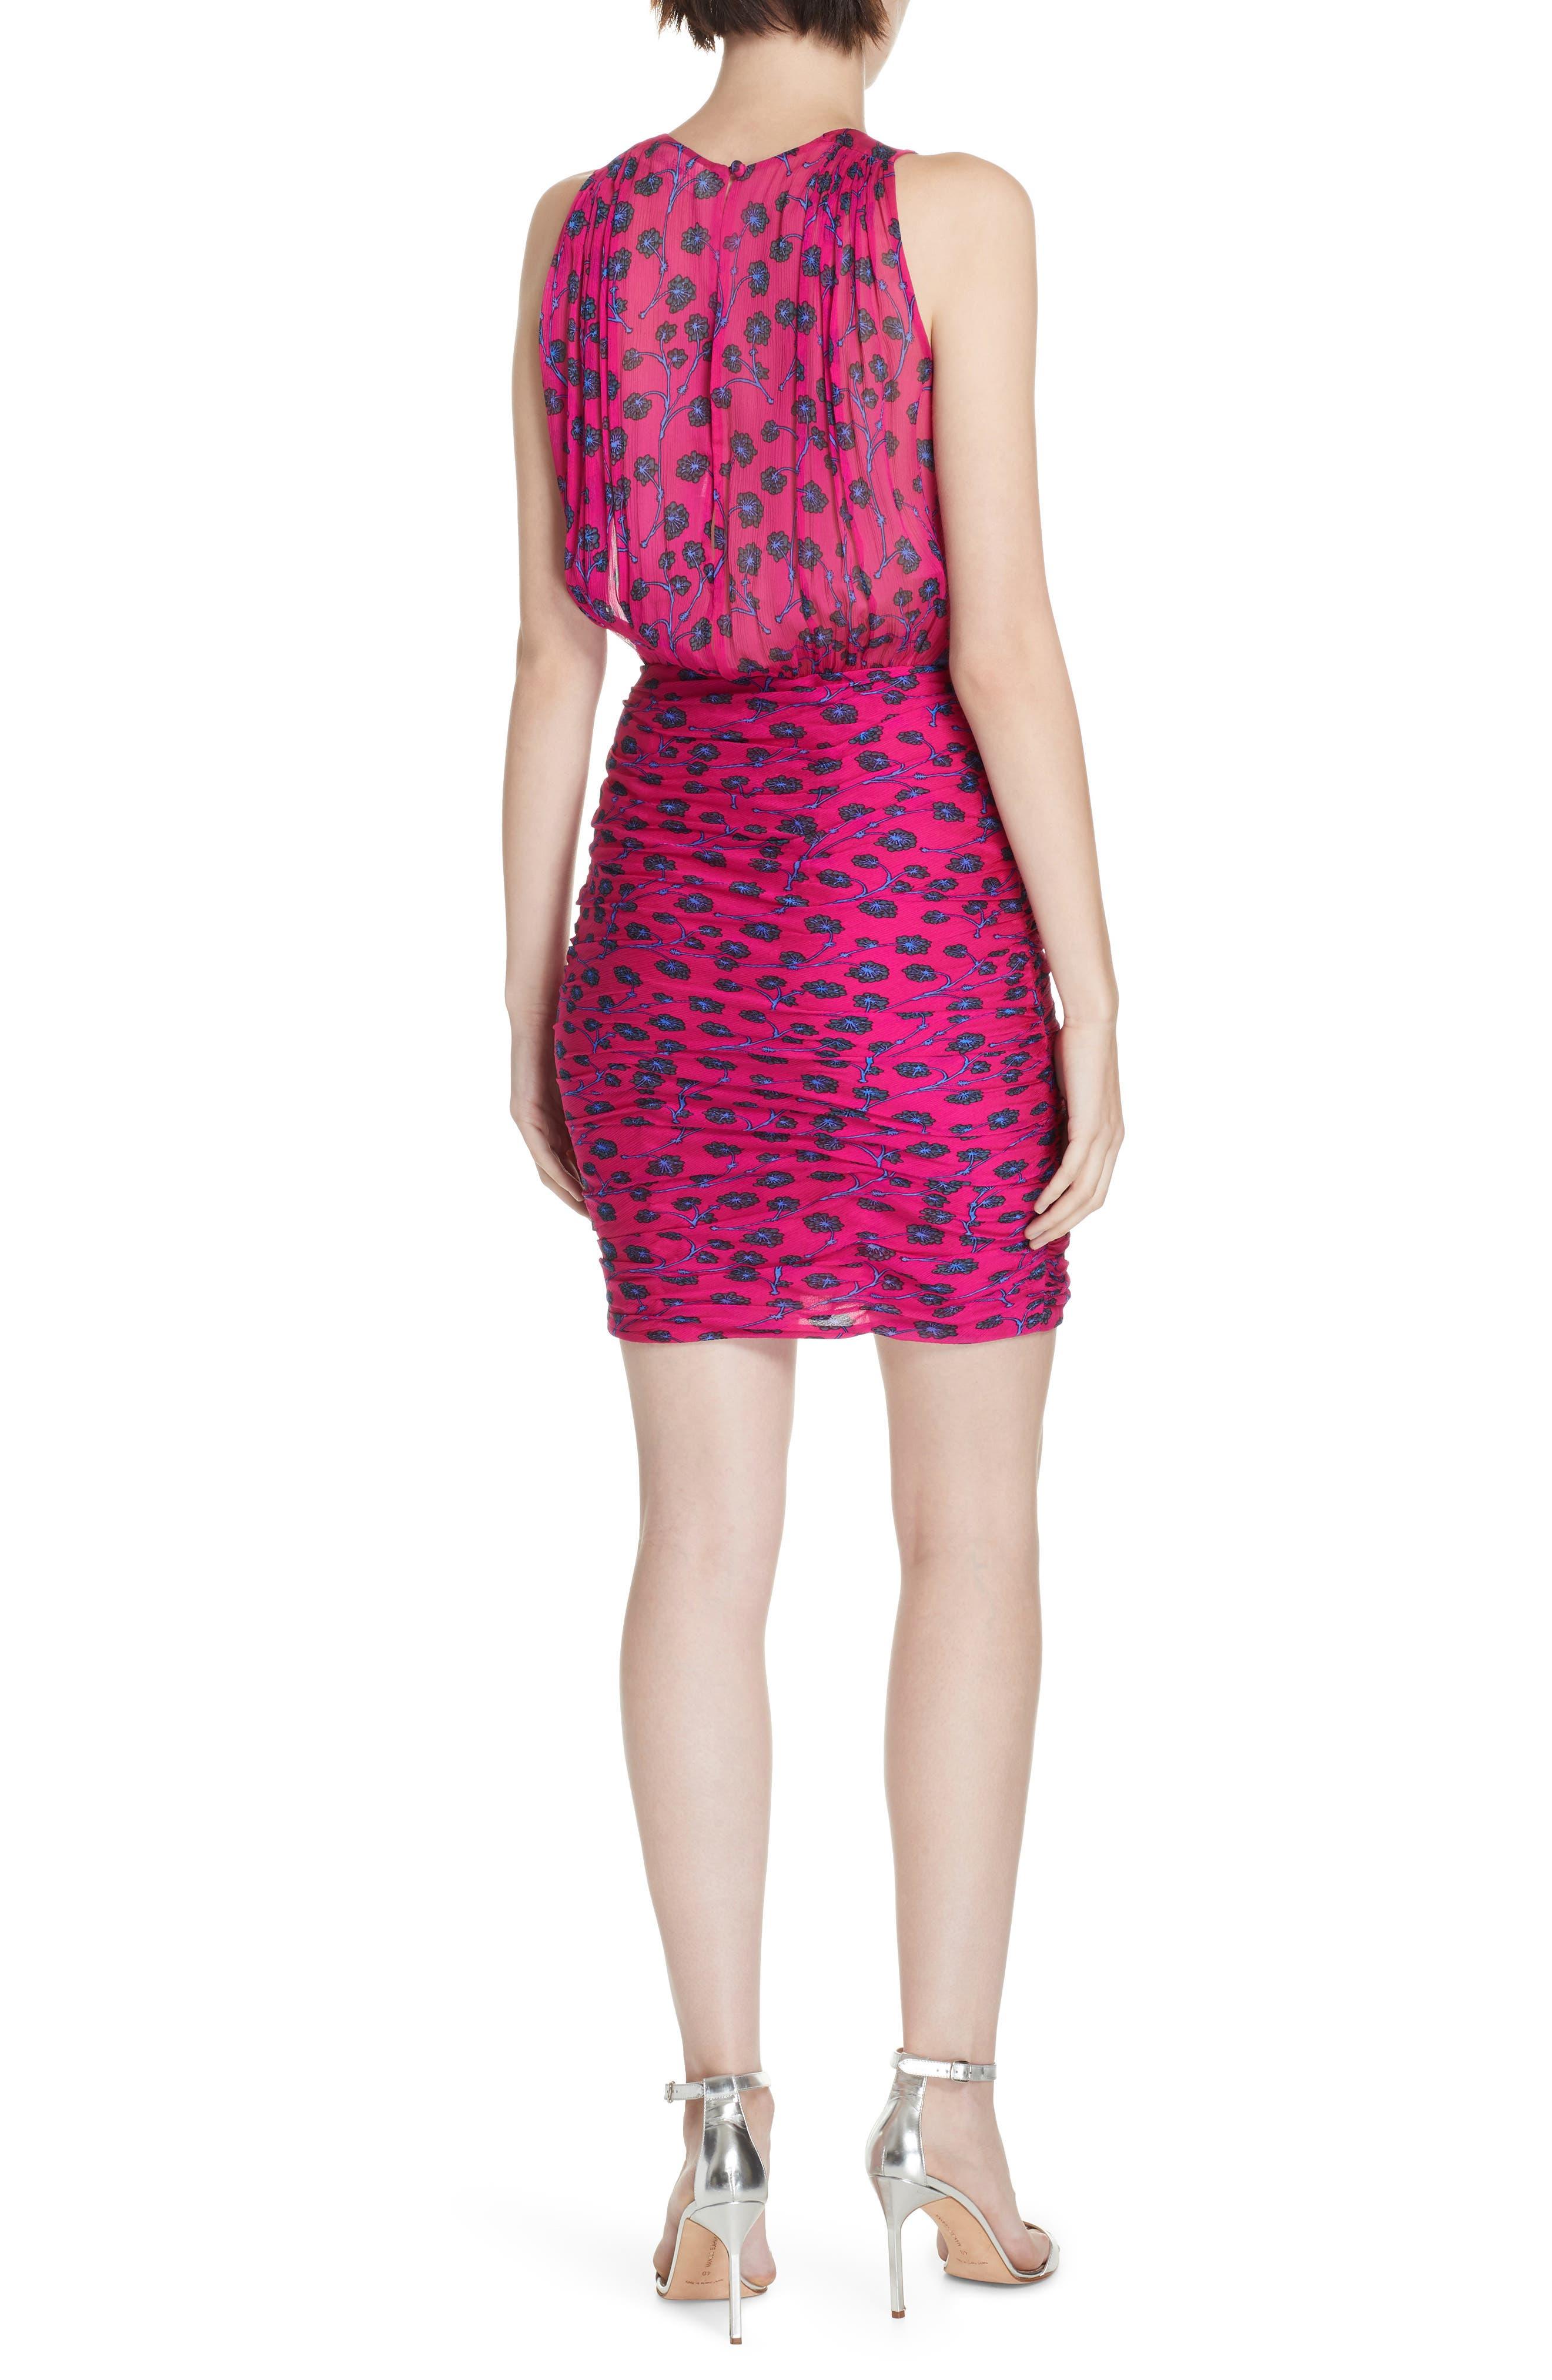 Micah Ruched Blouson Dress,                             Alternate thumbnail 2, color,                             DRAGON BERRY DITSY PINK